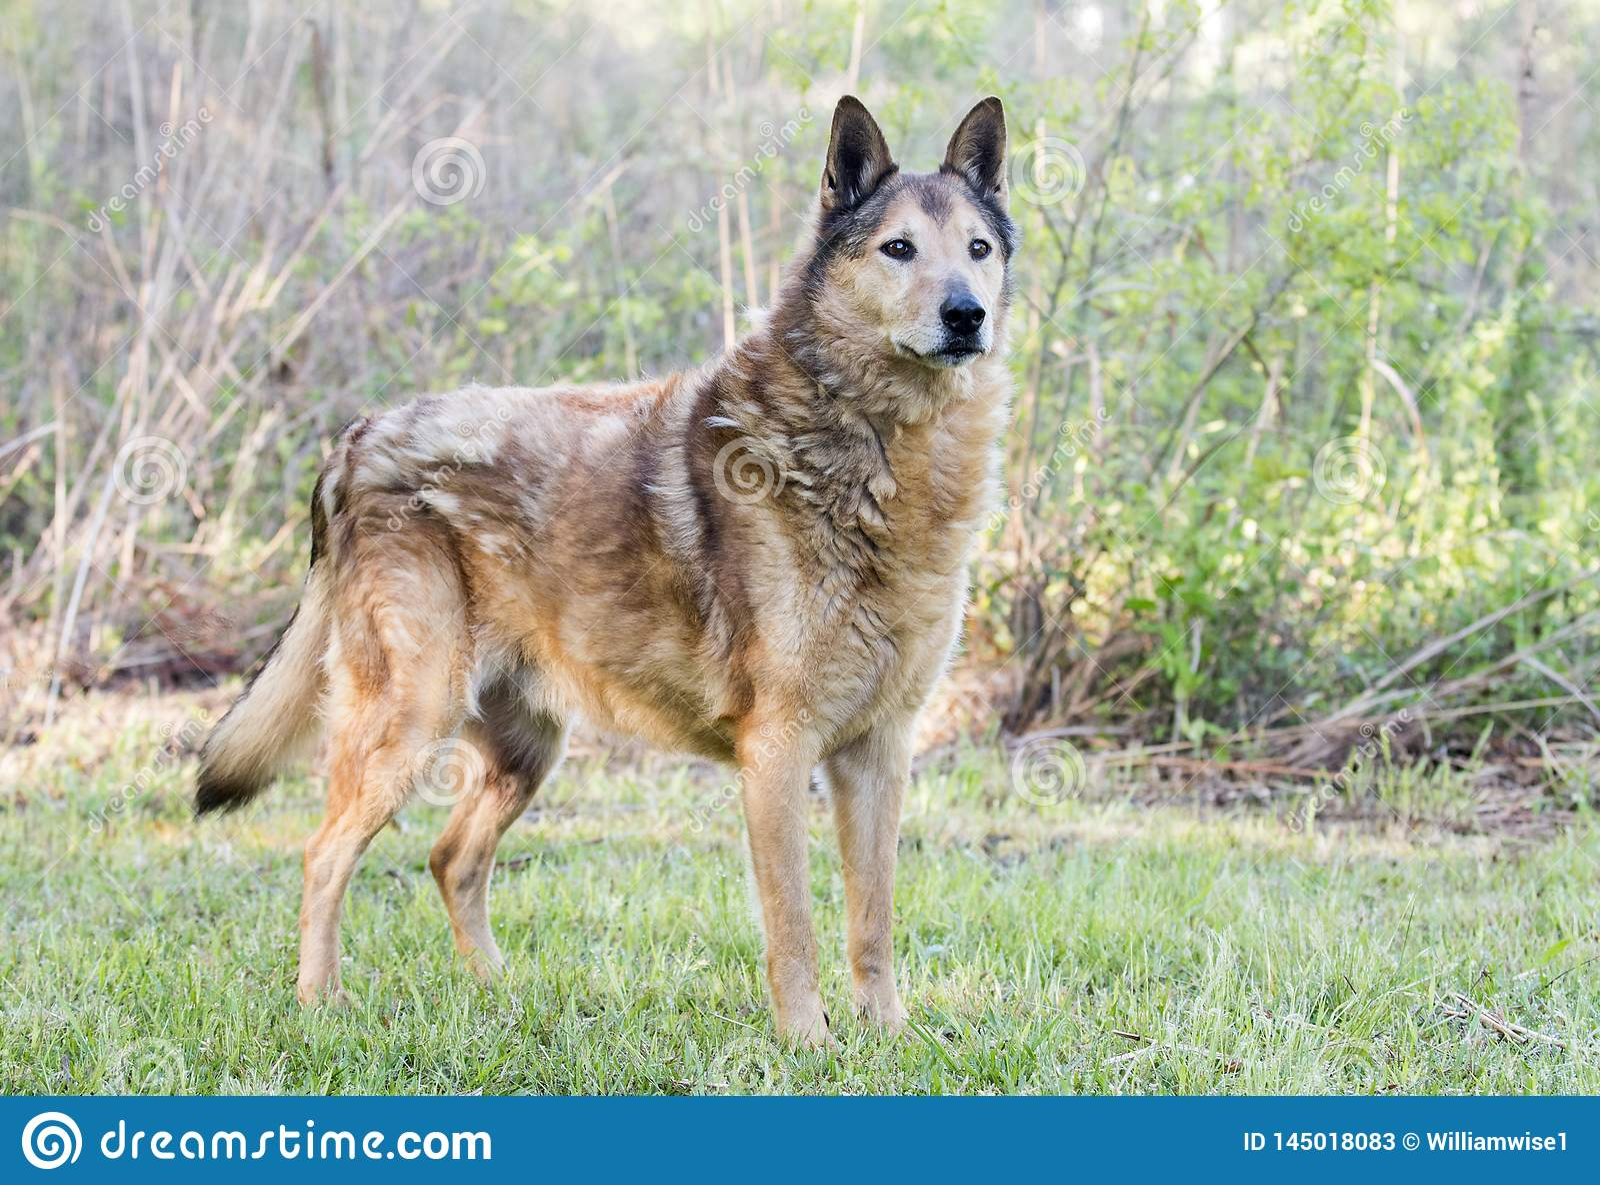 Senior Collie and German Shepherd mix breed dog